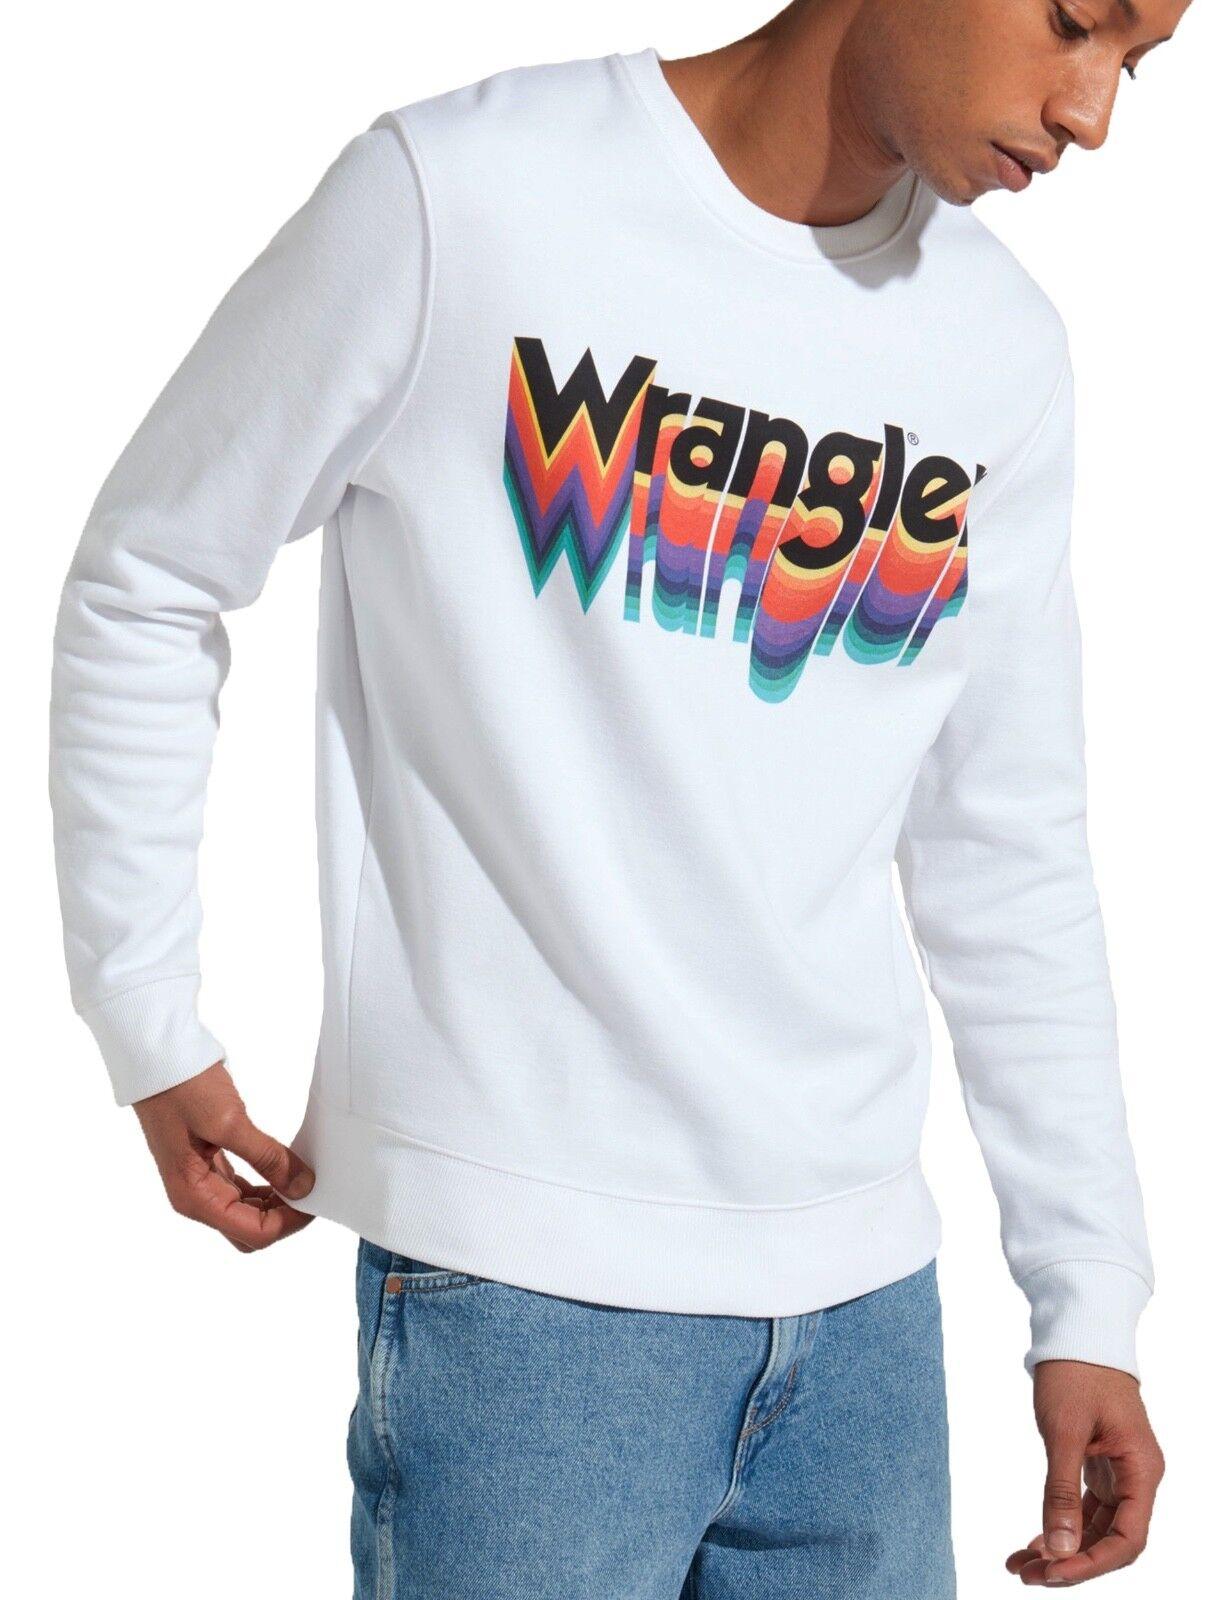 WRANGLER Retro 80s Funky Big Logo Crew Neck Sweatshirt Weiß Sweat Top